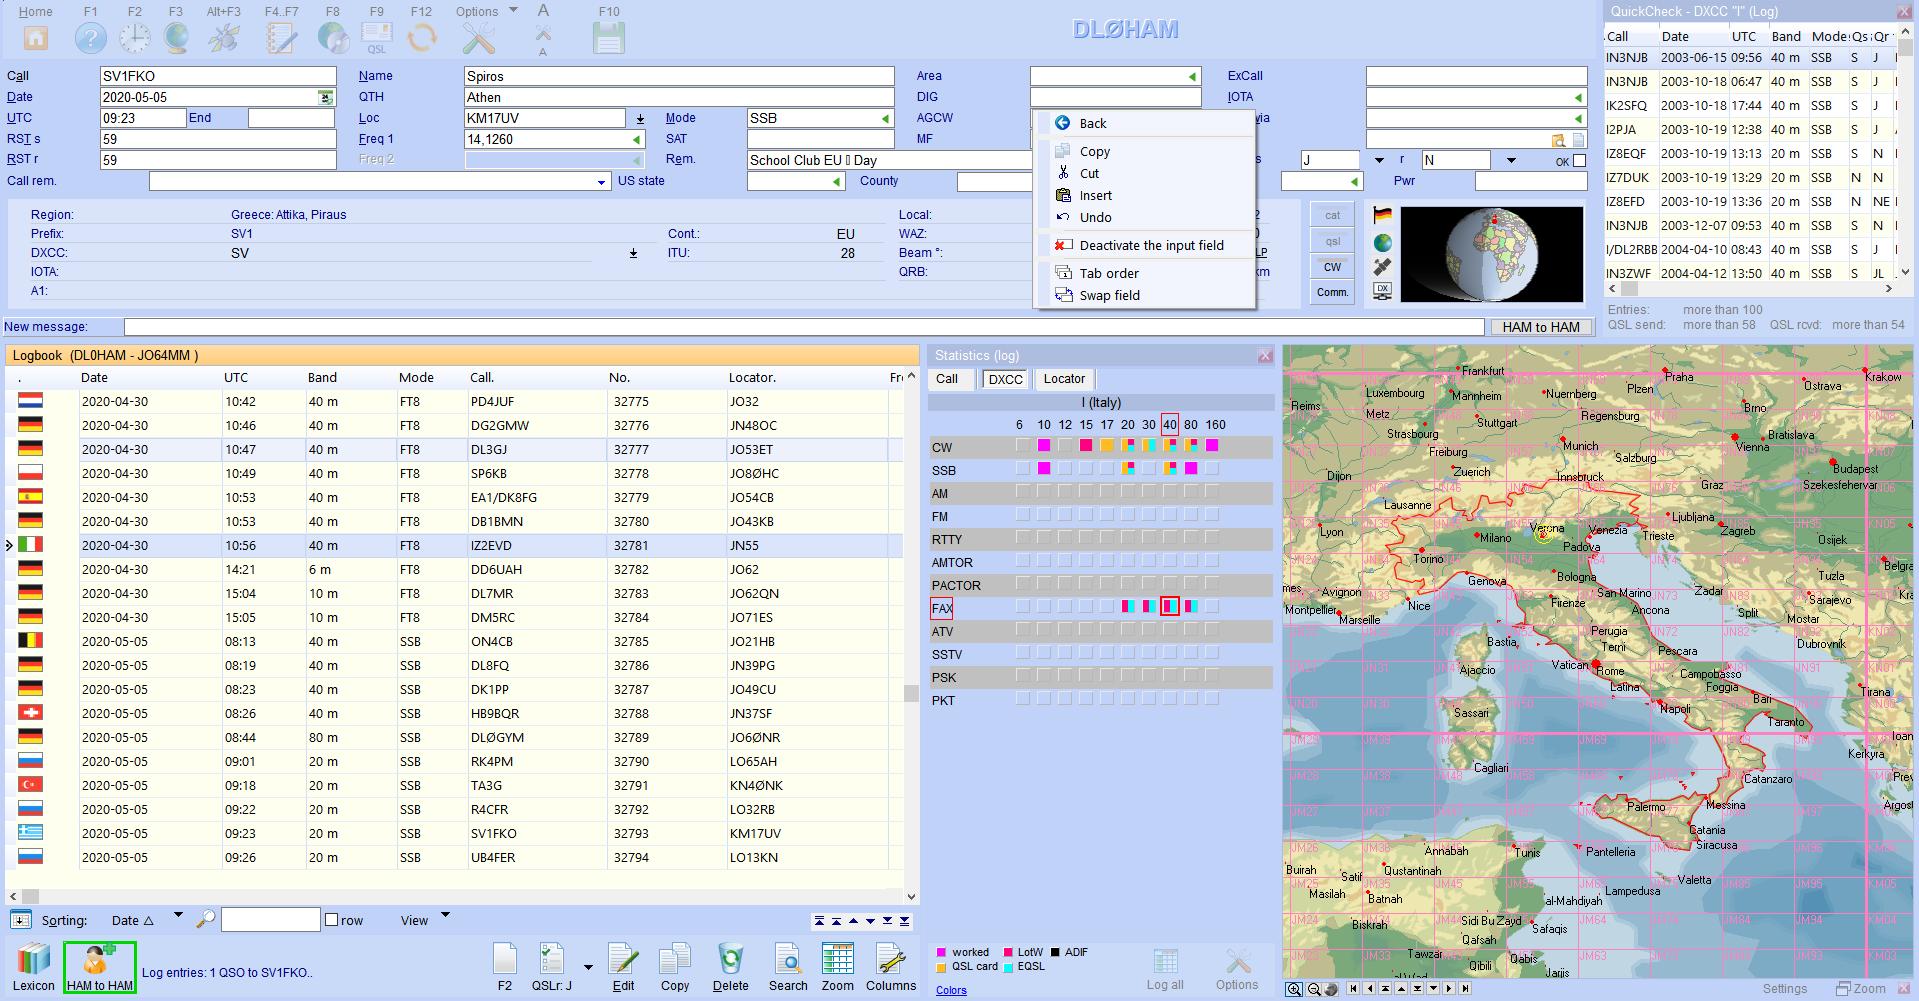 qsoinput menu for fields hamoffice my amateur radio logbook